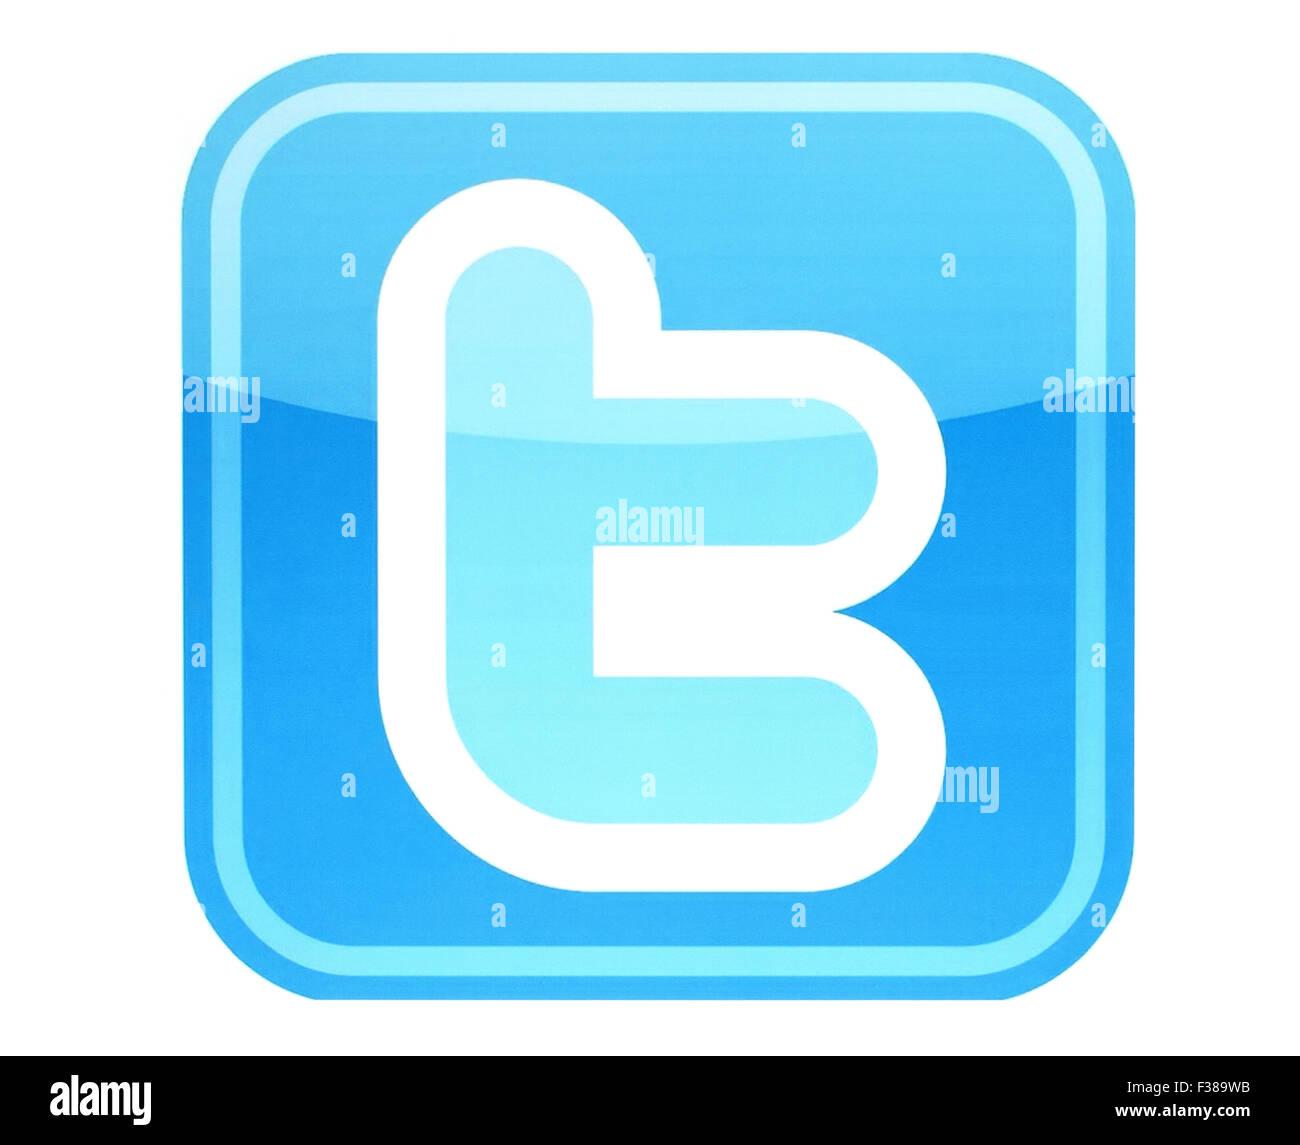 KIEV, UKRAINE - MAY 26, 2015:Twitter logotype printed on paper. - Stock Image